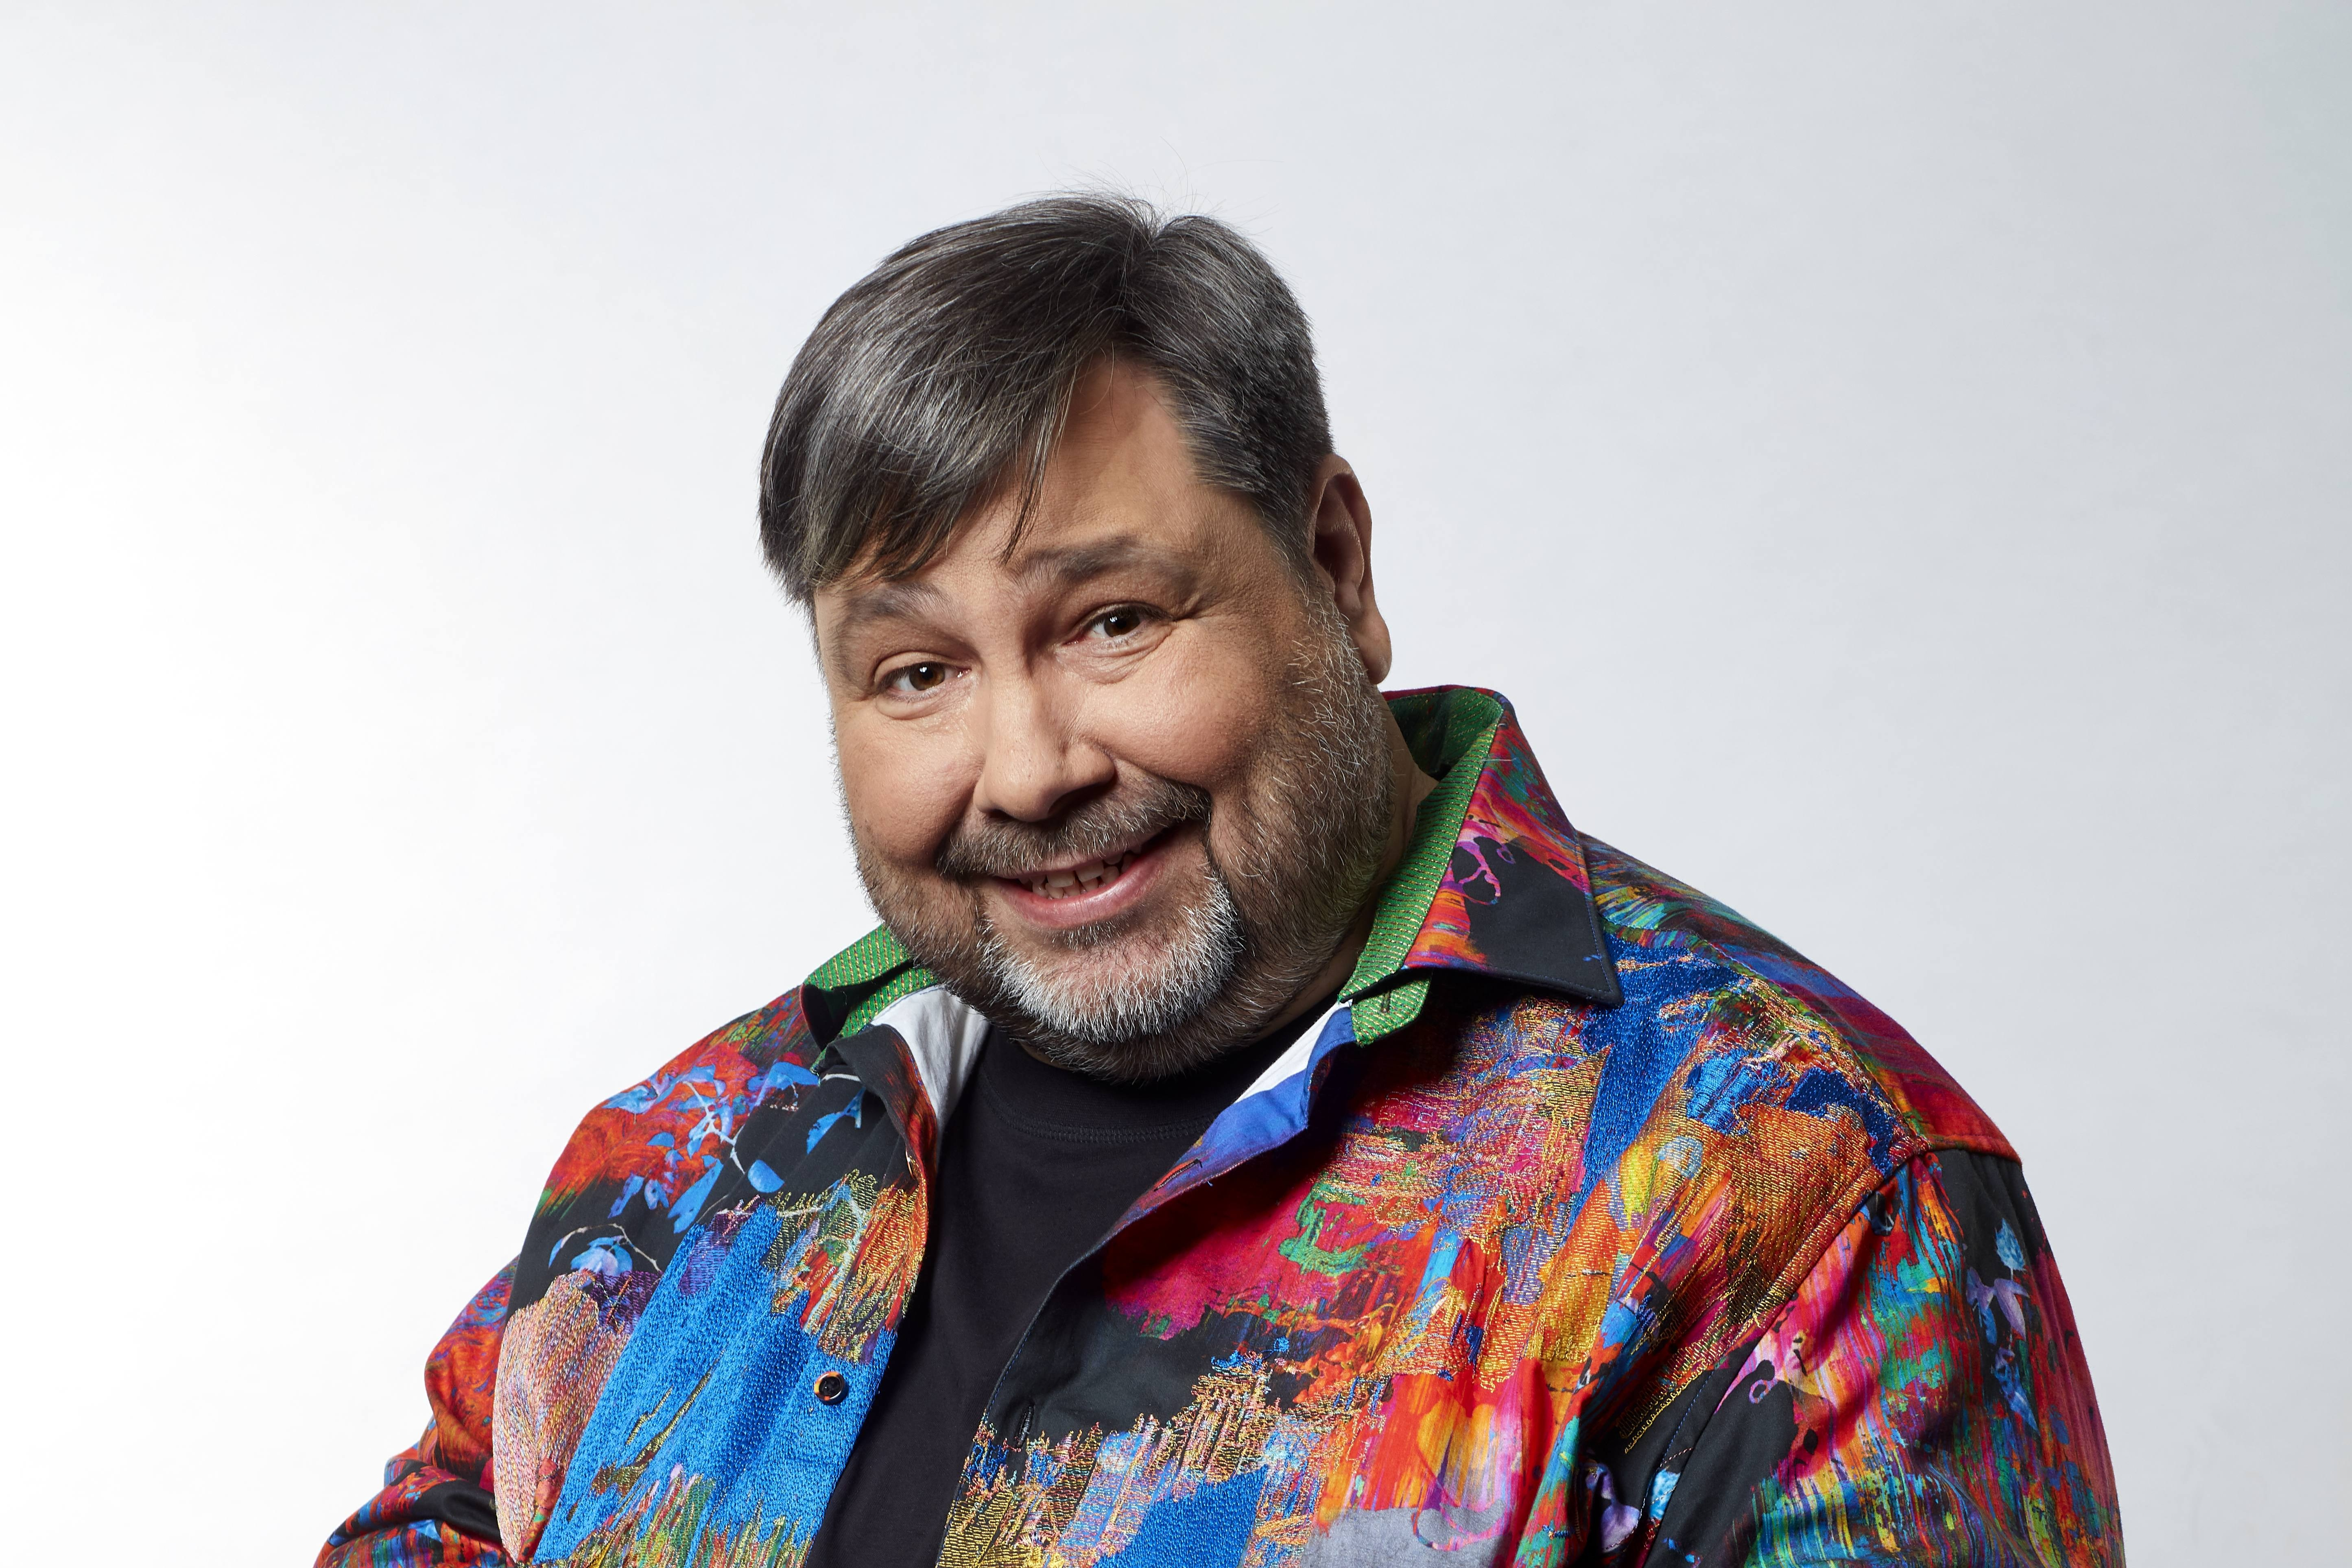 Luboš Xaver Veselý